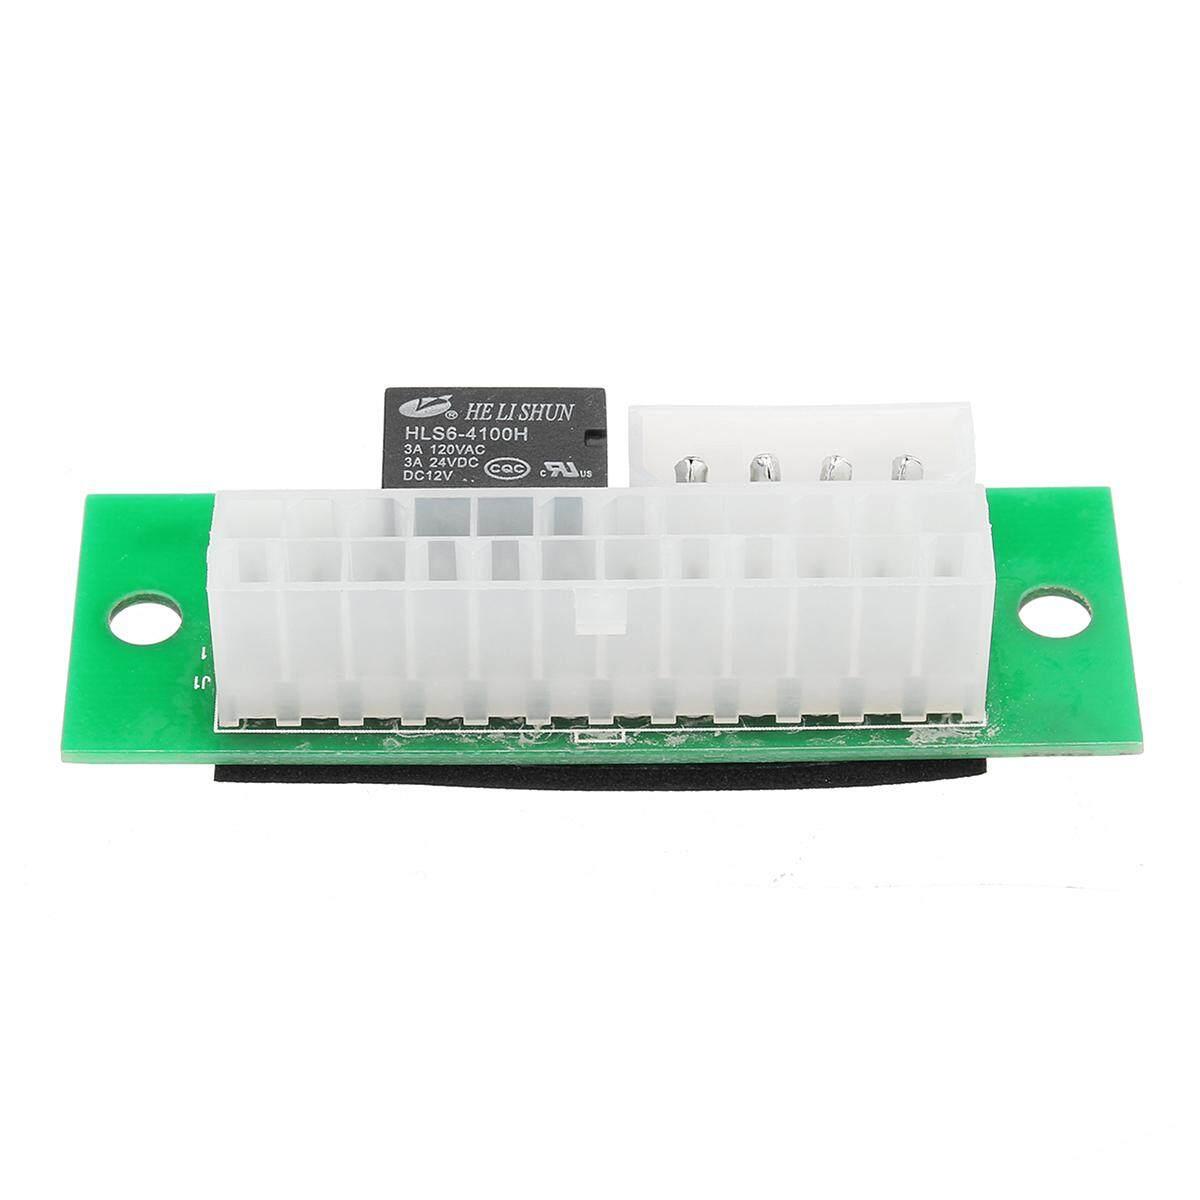 ADD2PSU Beberapa Penyalur Daya Adaptor Dual Power Sinkron Boot Kartu